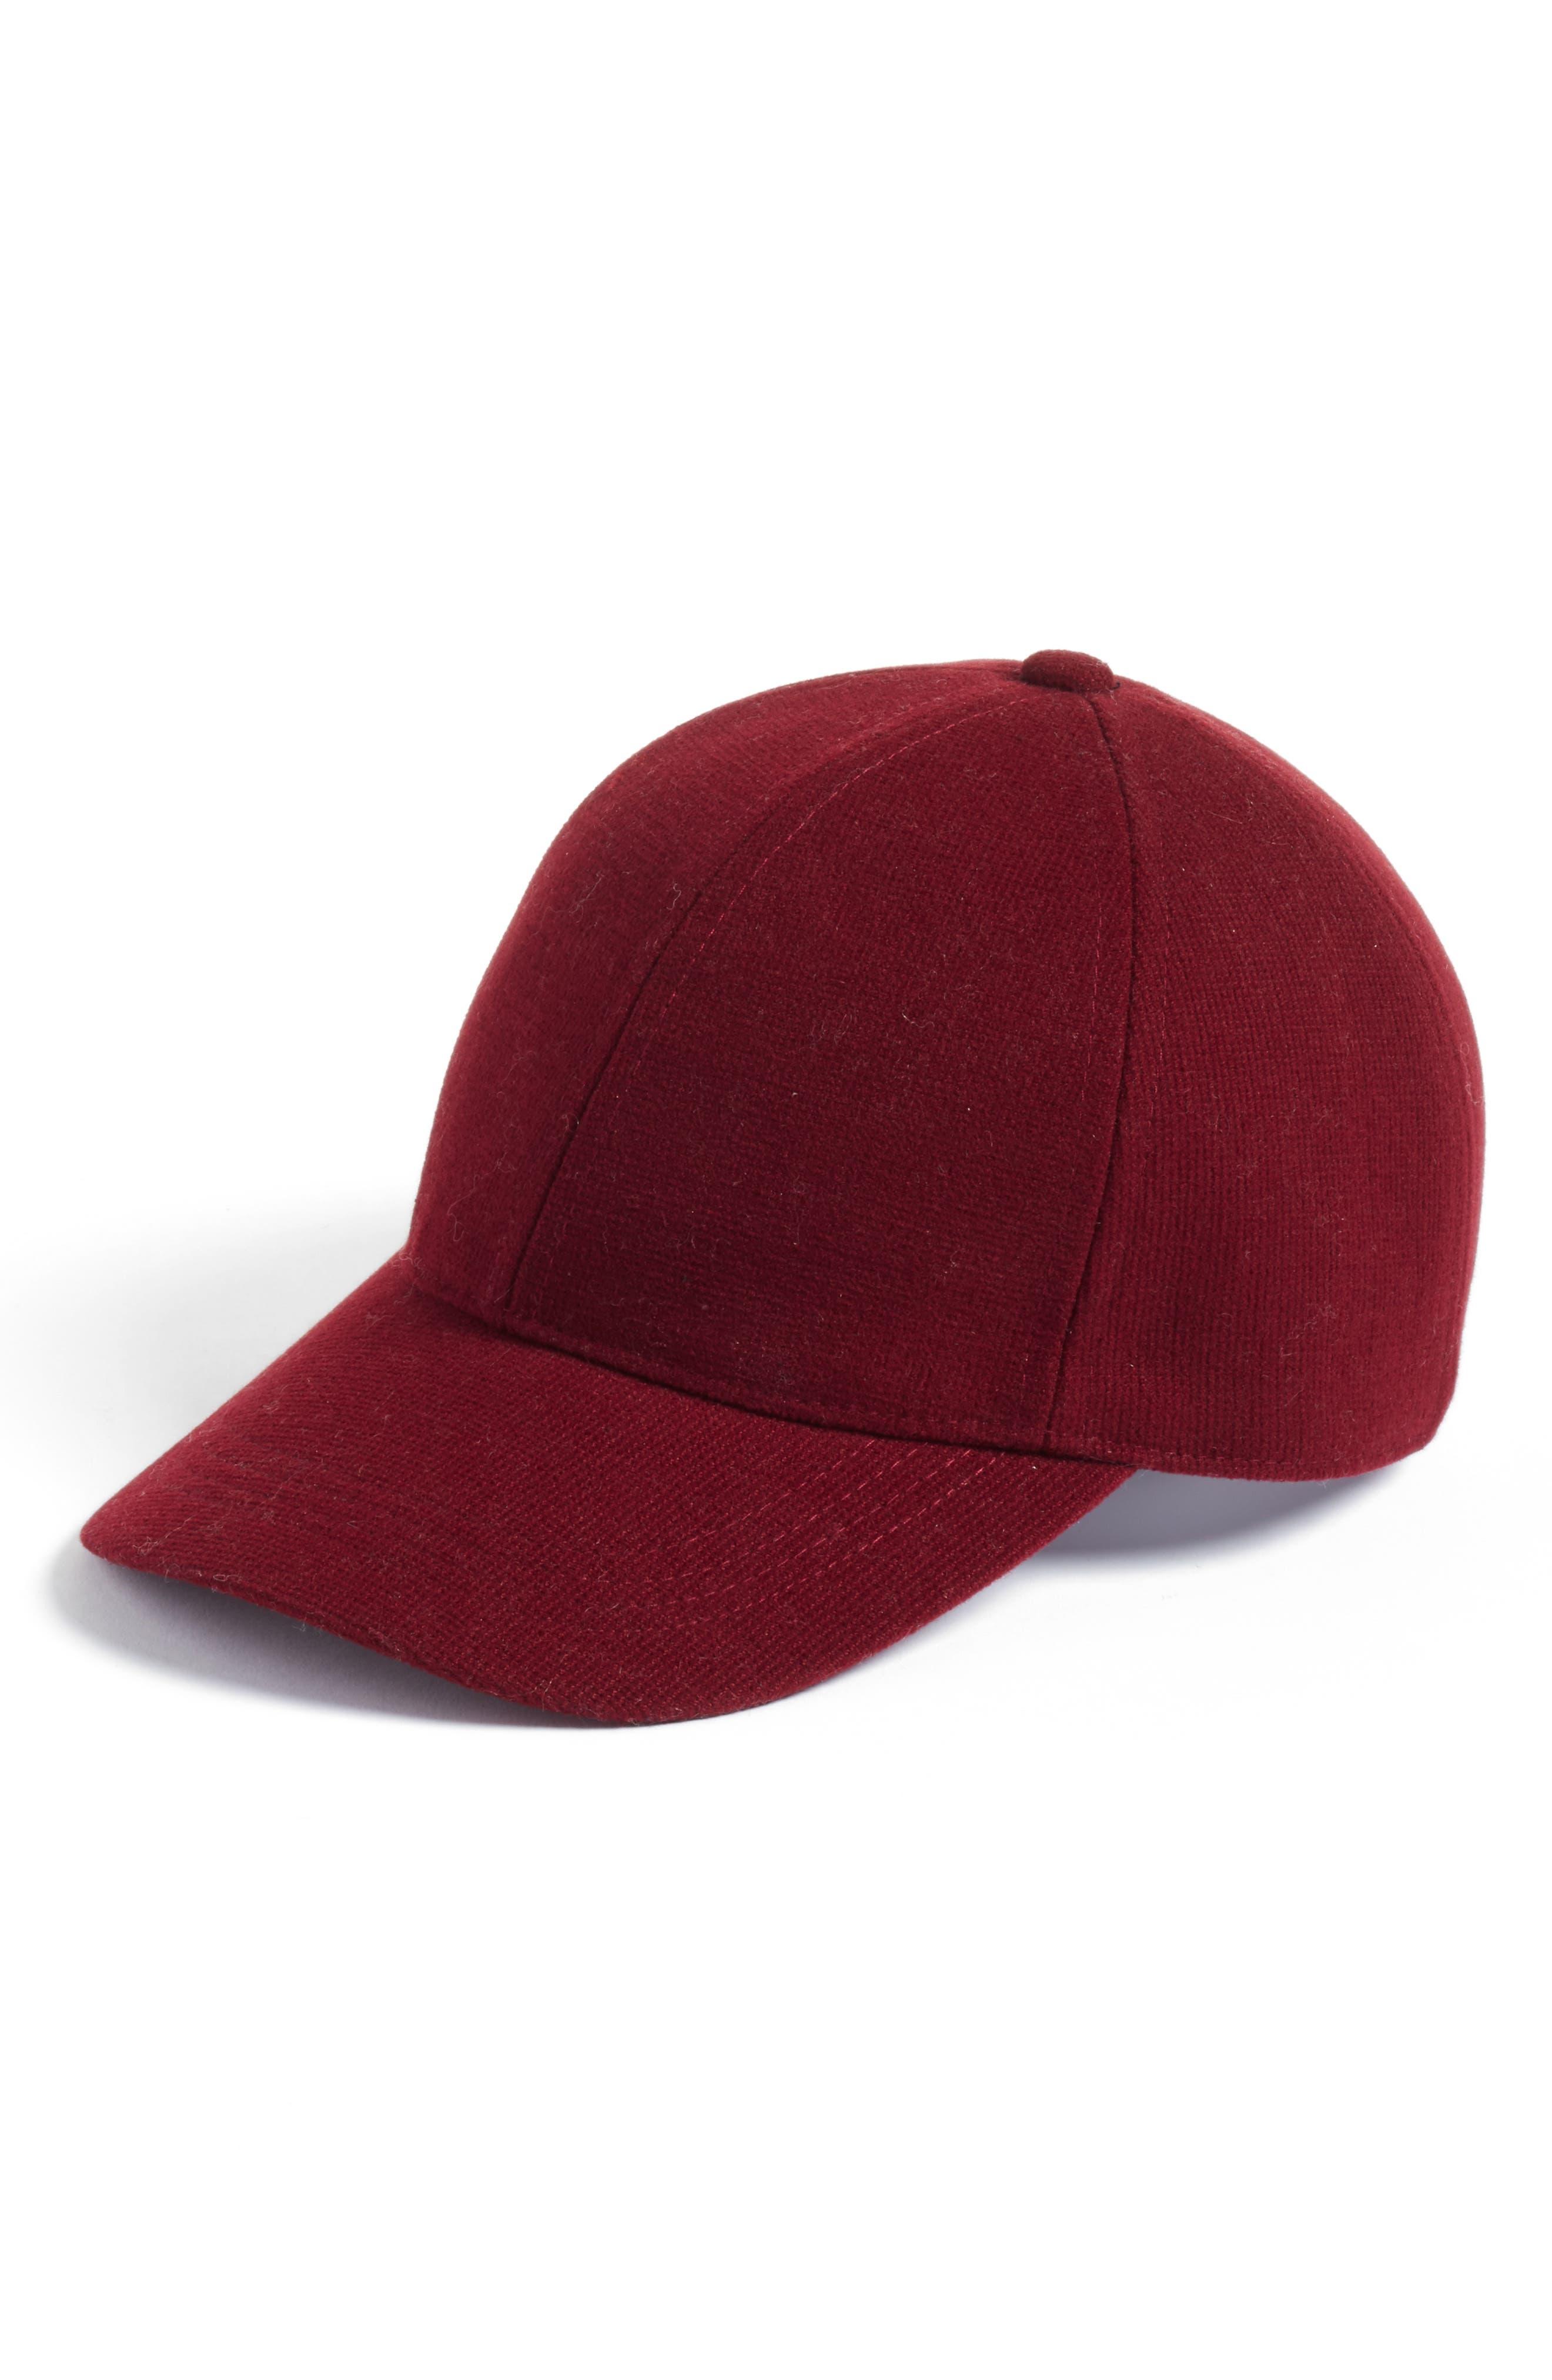 Main Image - Treasure & Bond Adjustable Baseball Cap